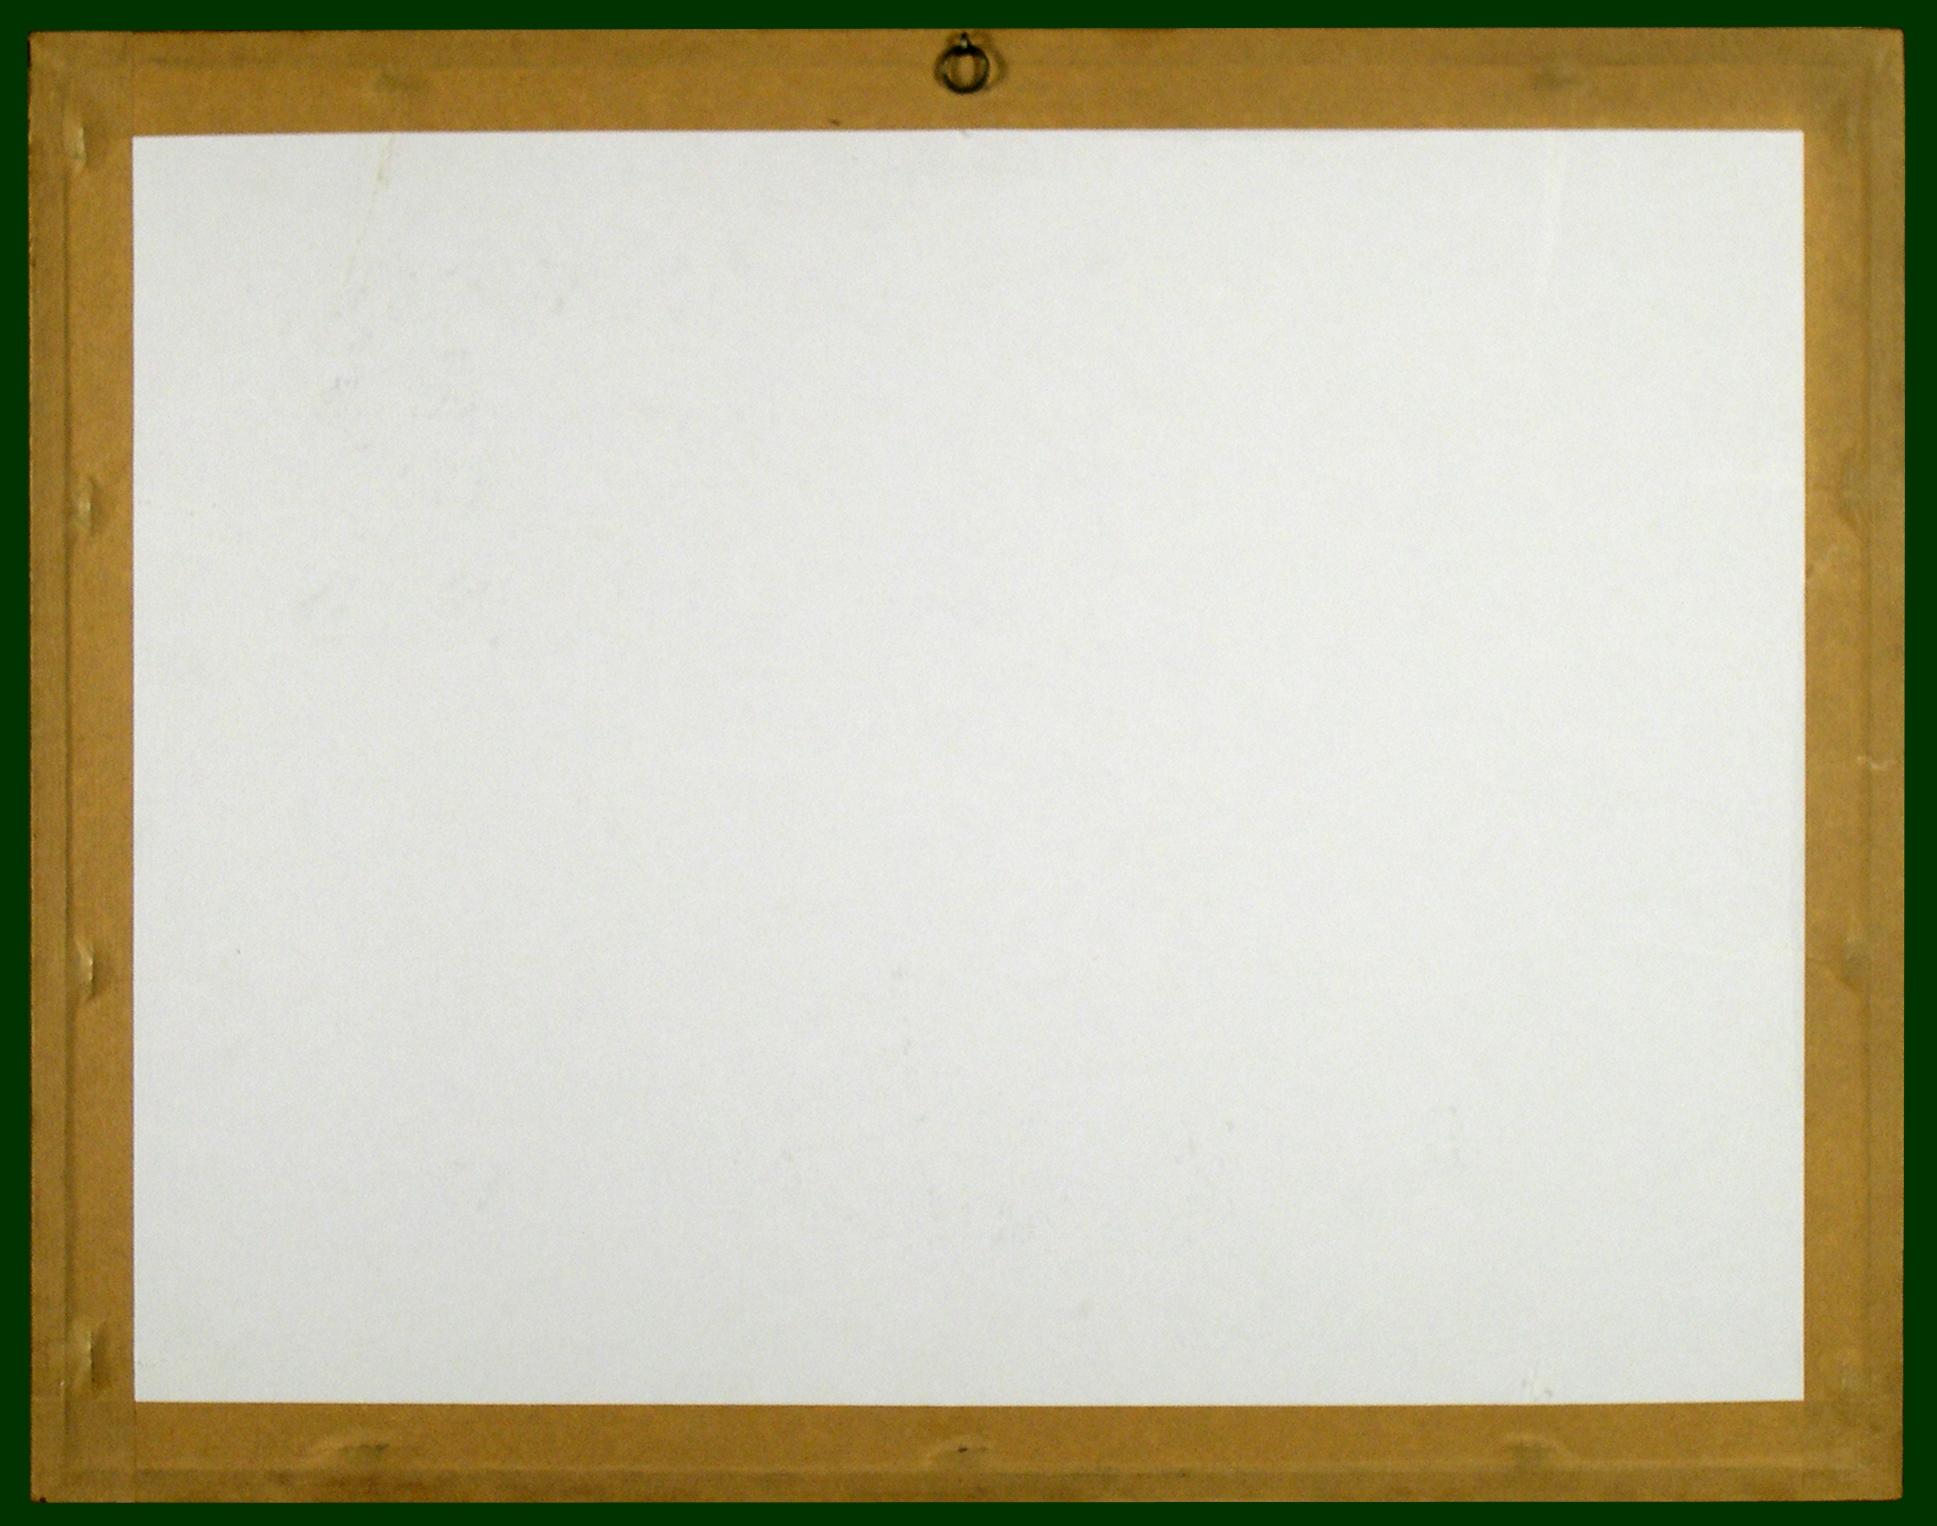 57-8h_t.JPG (1937×1526)